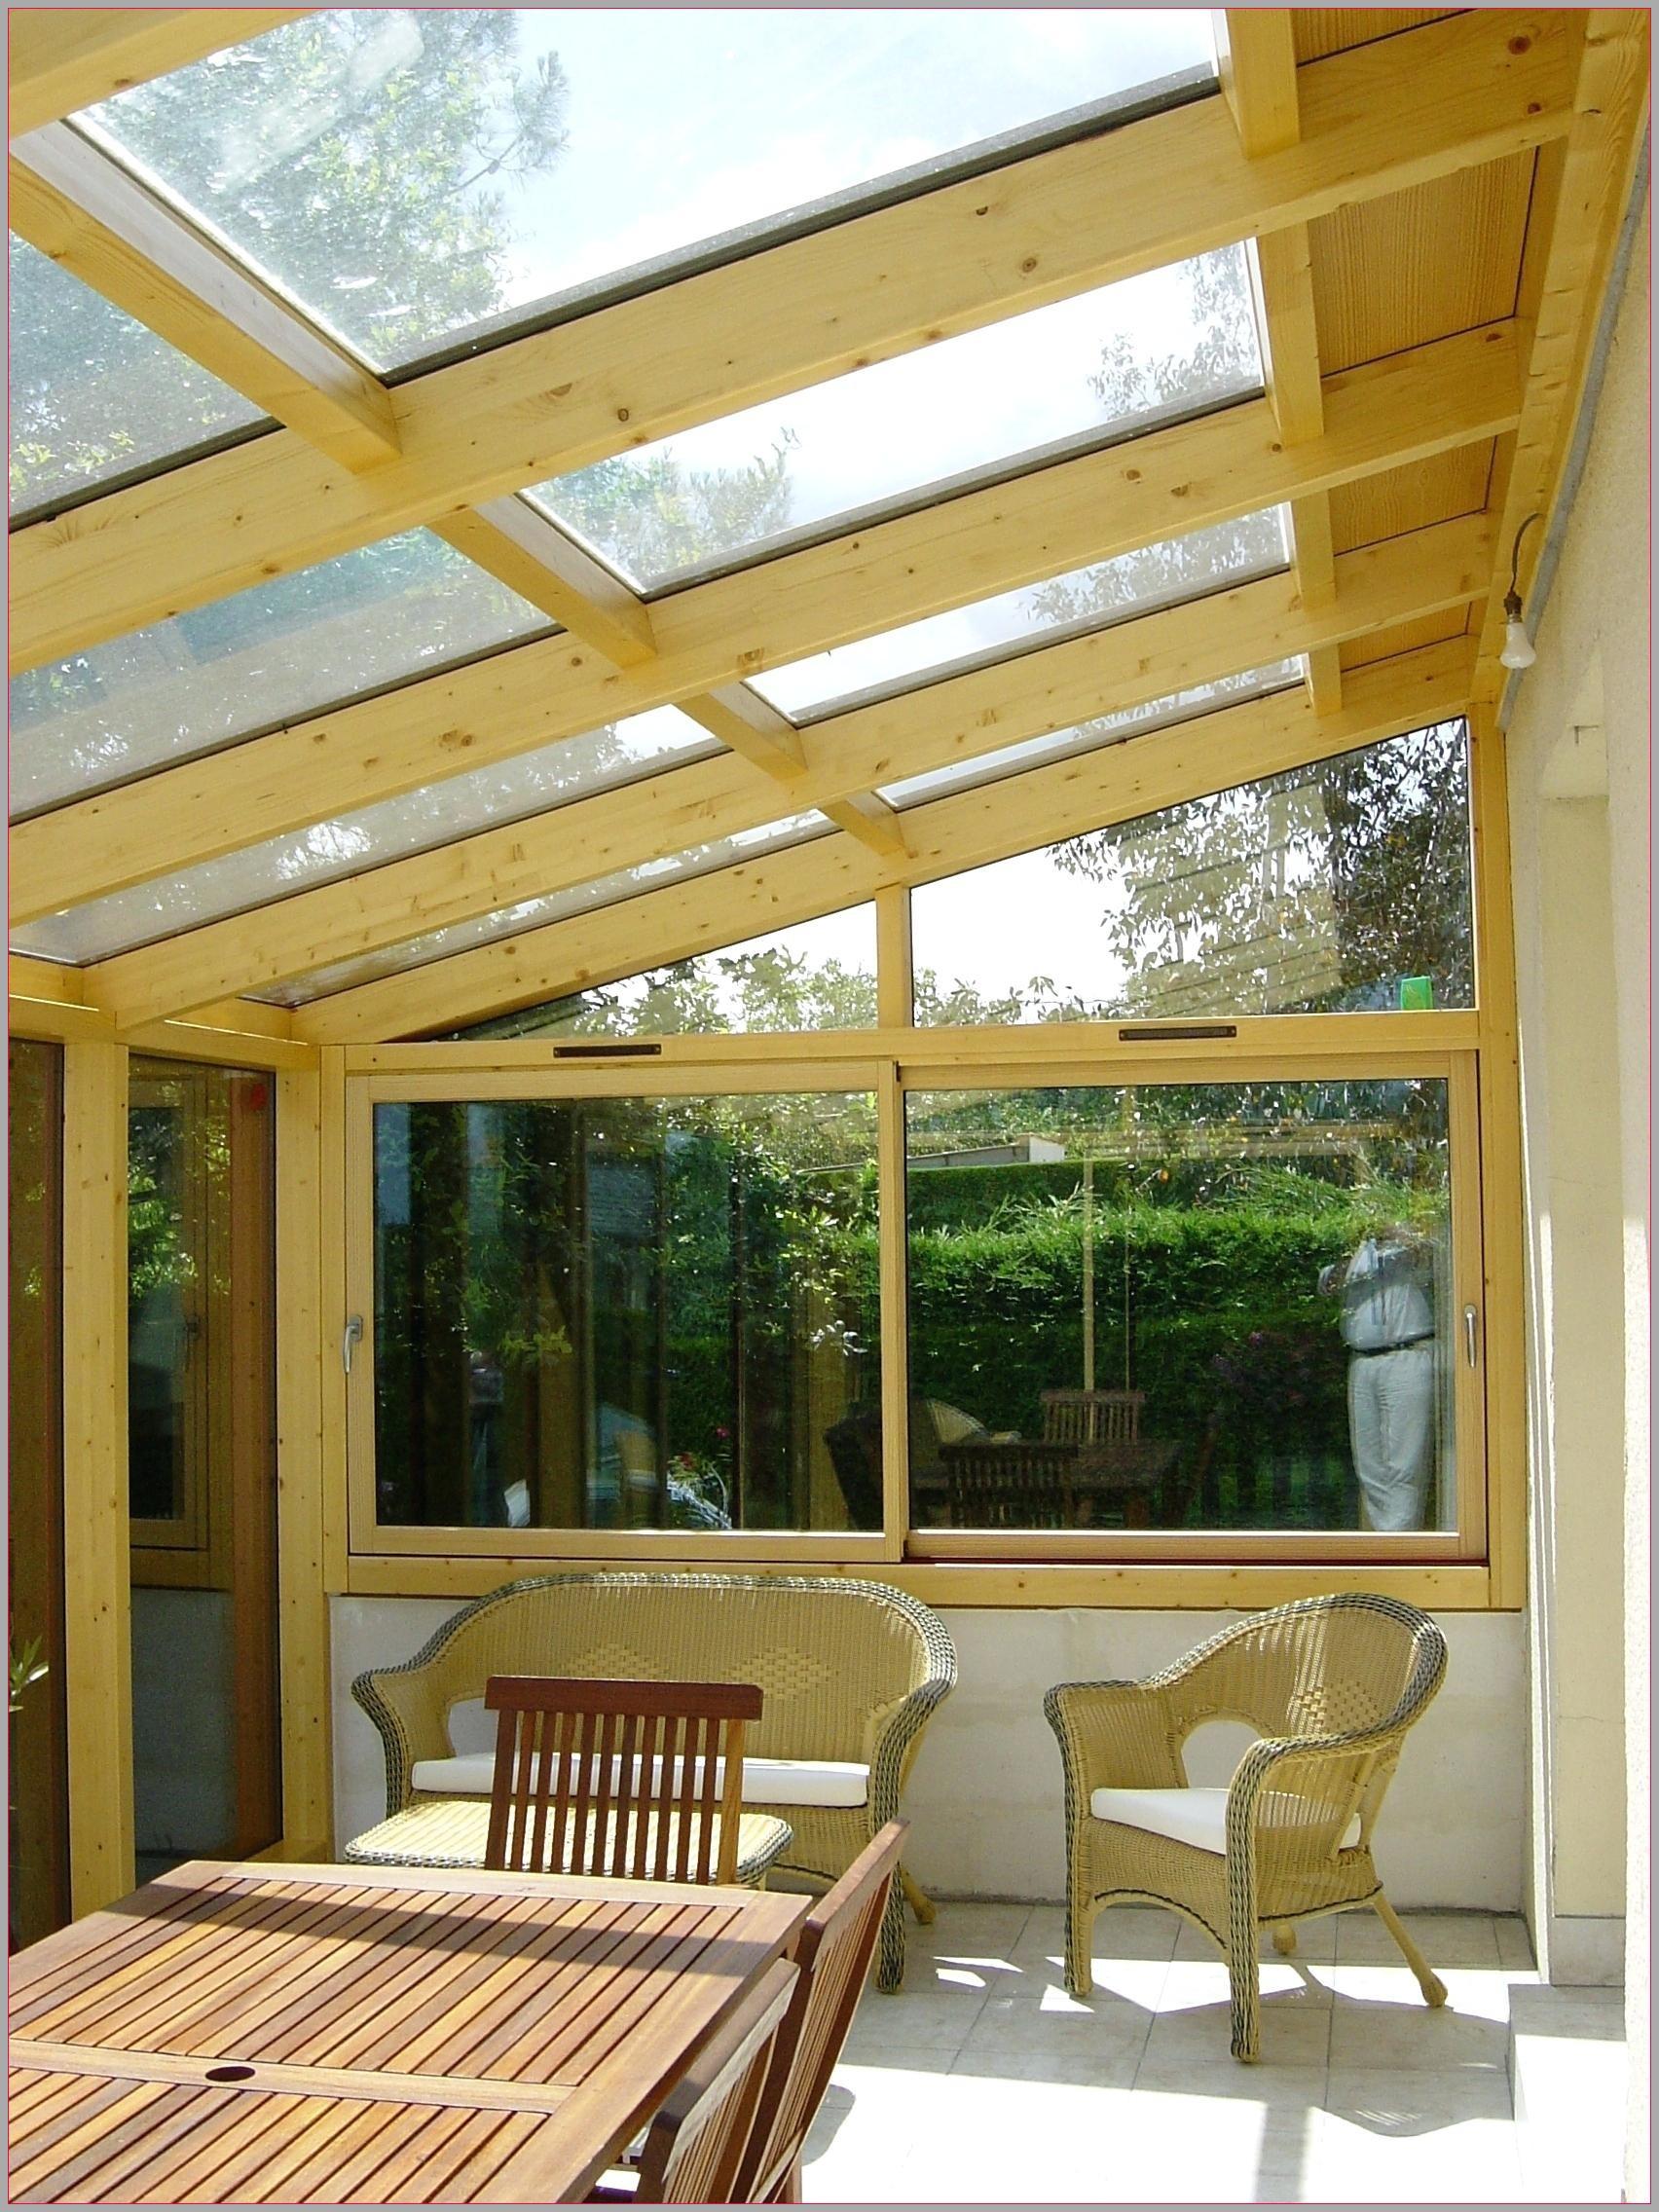 Veranda en verre en kit - veranda-styledevie.fr